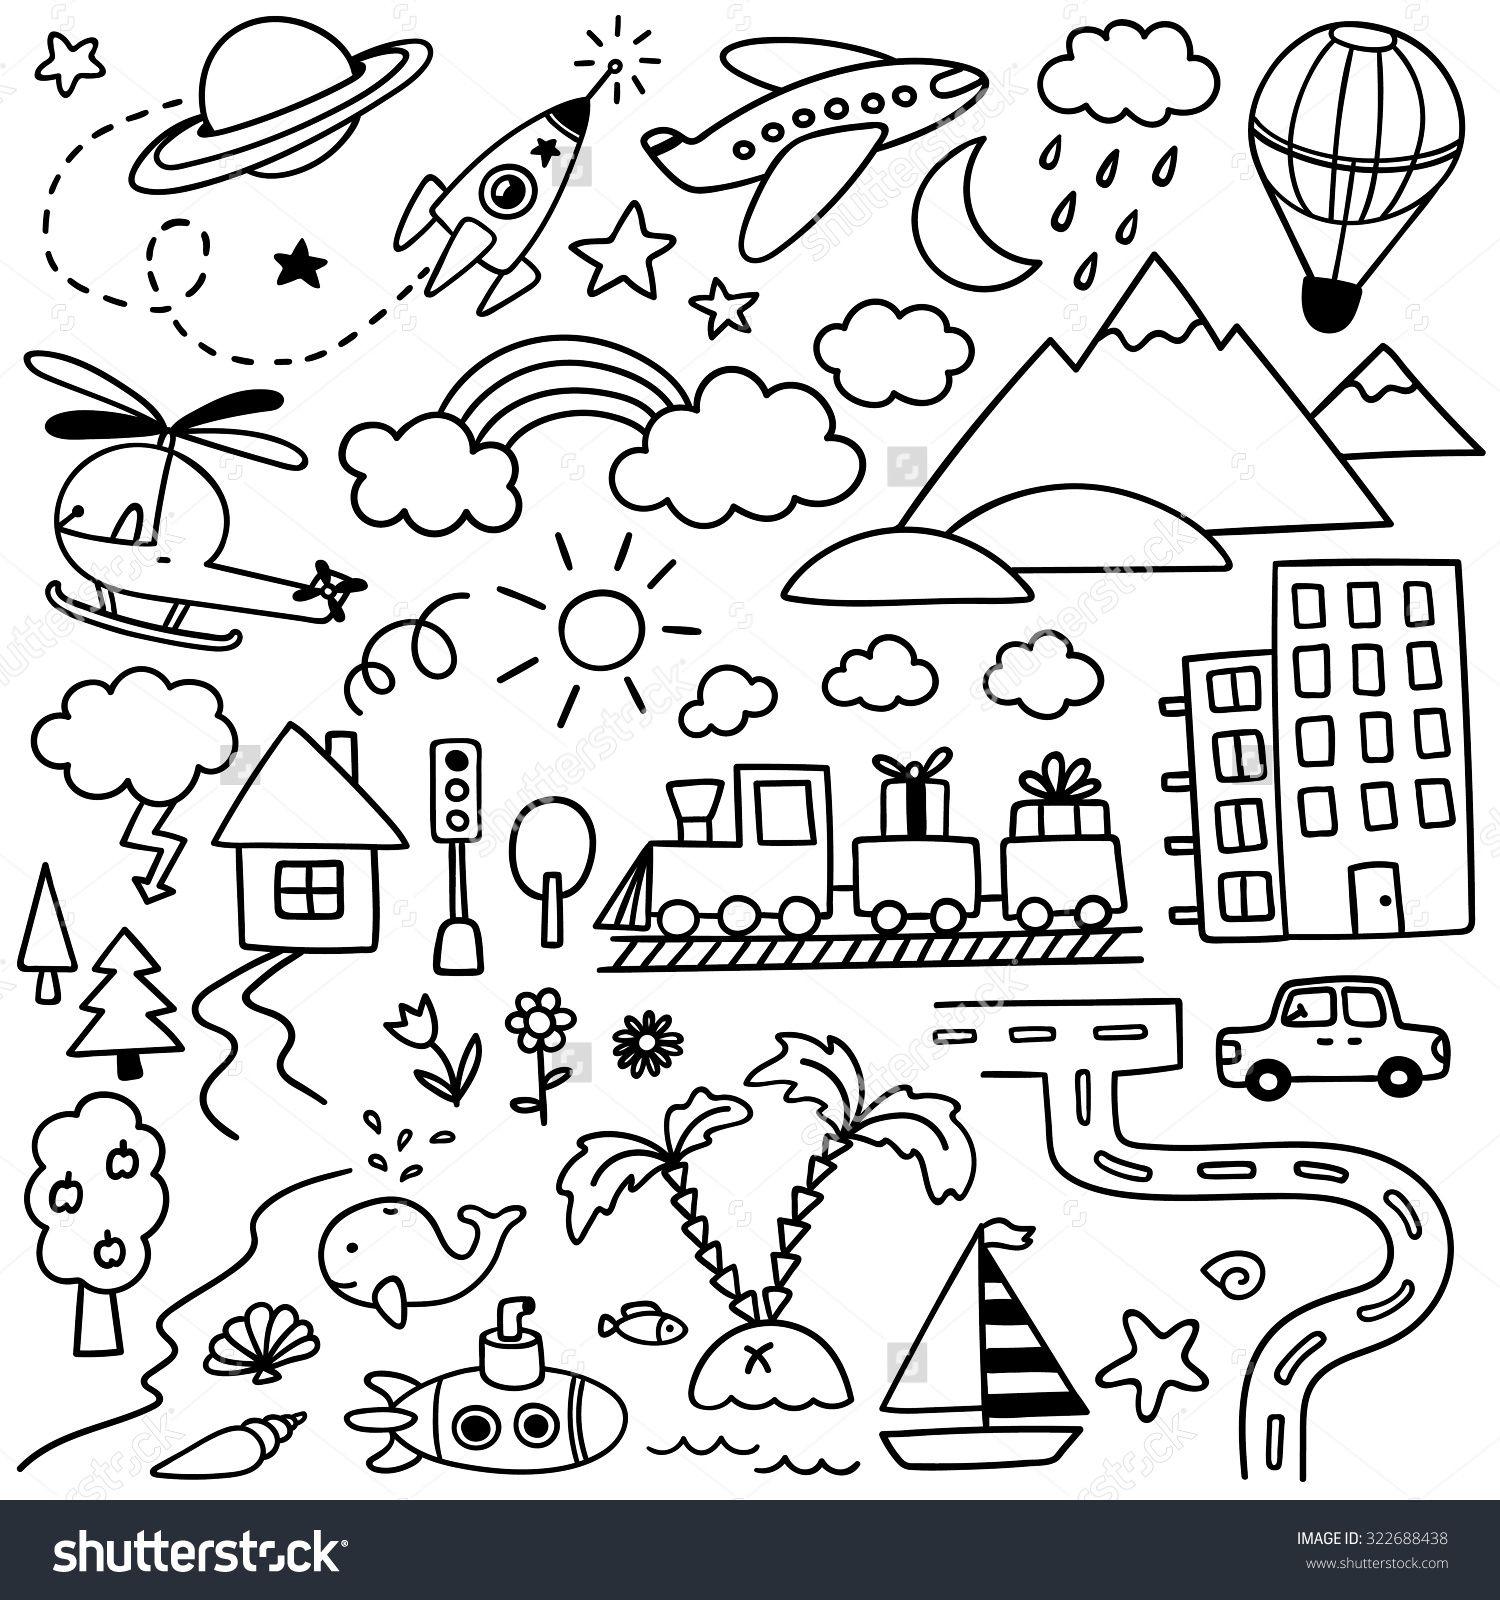 hand drawn kids doodle set schriftarten icons grafiken